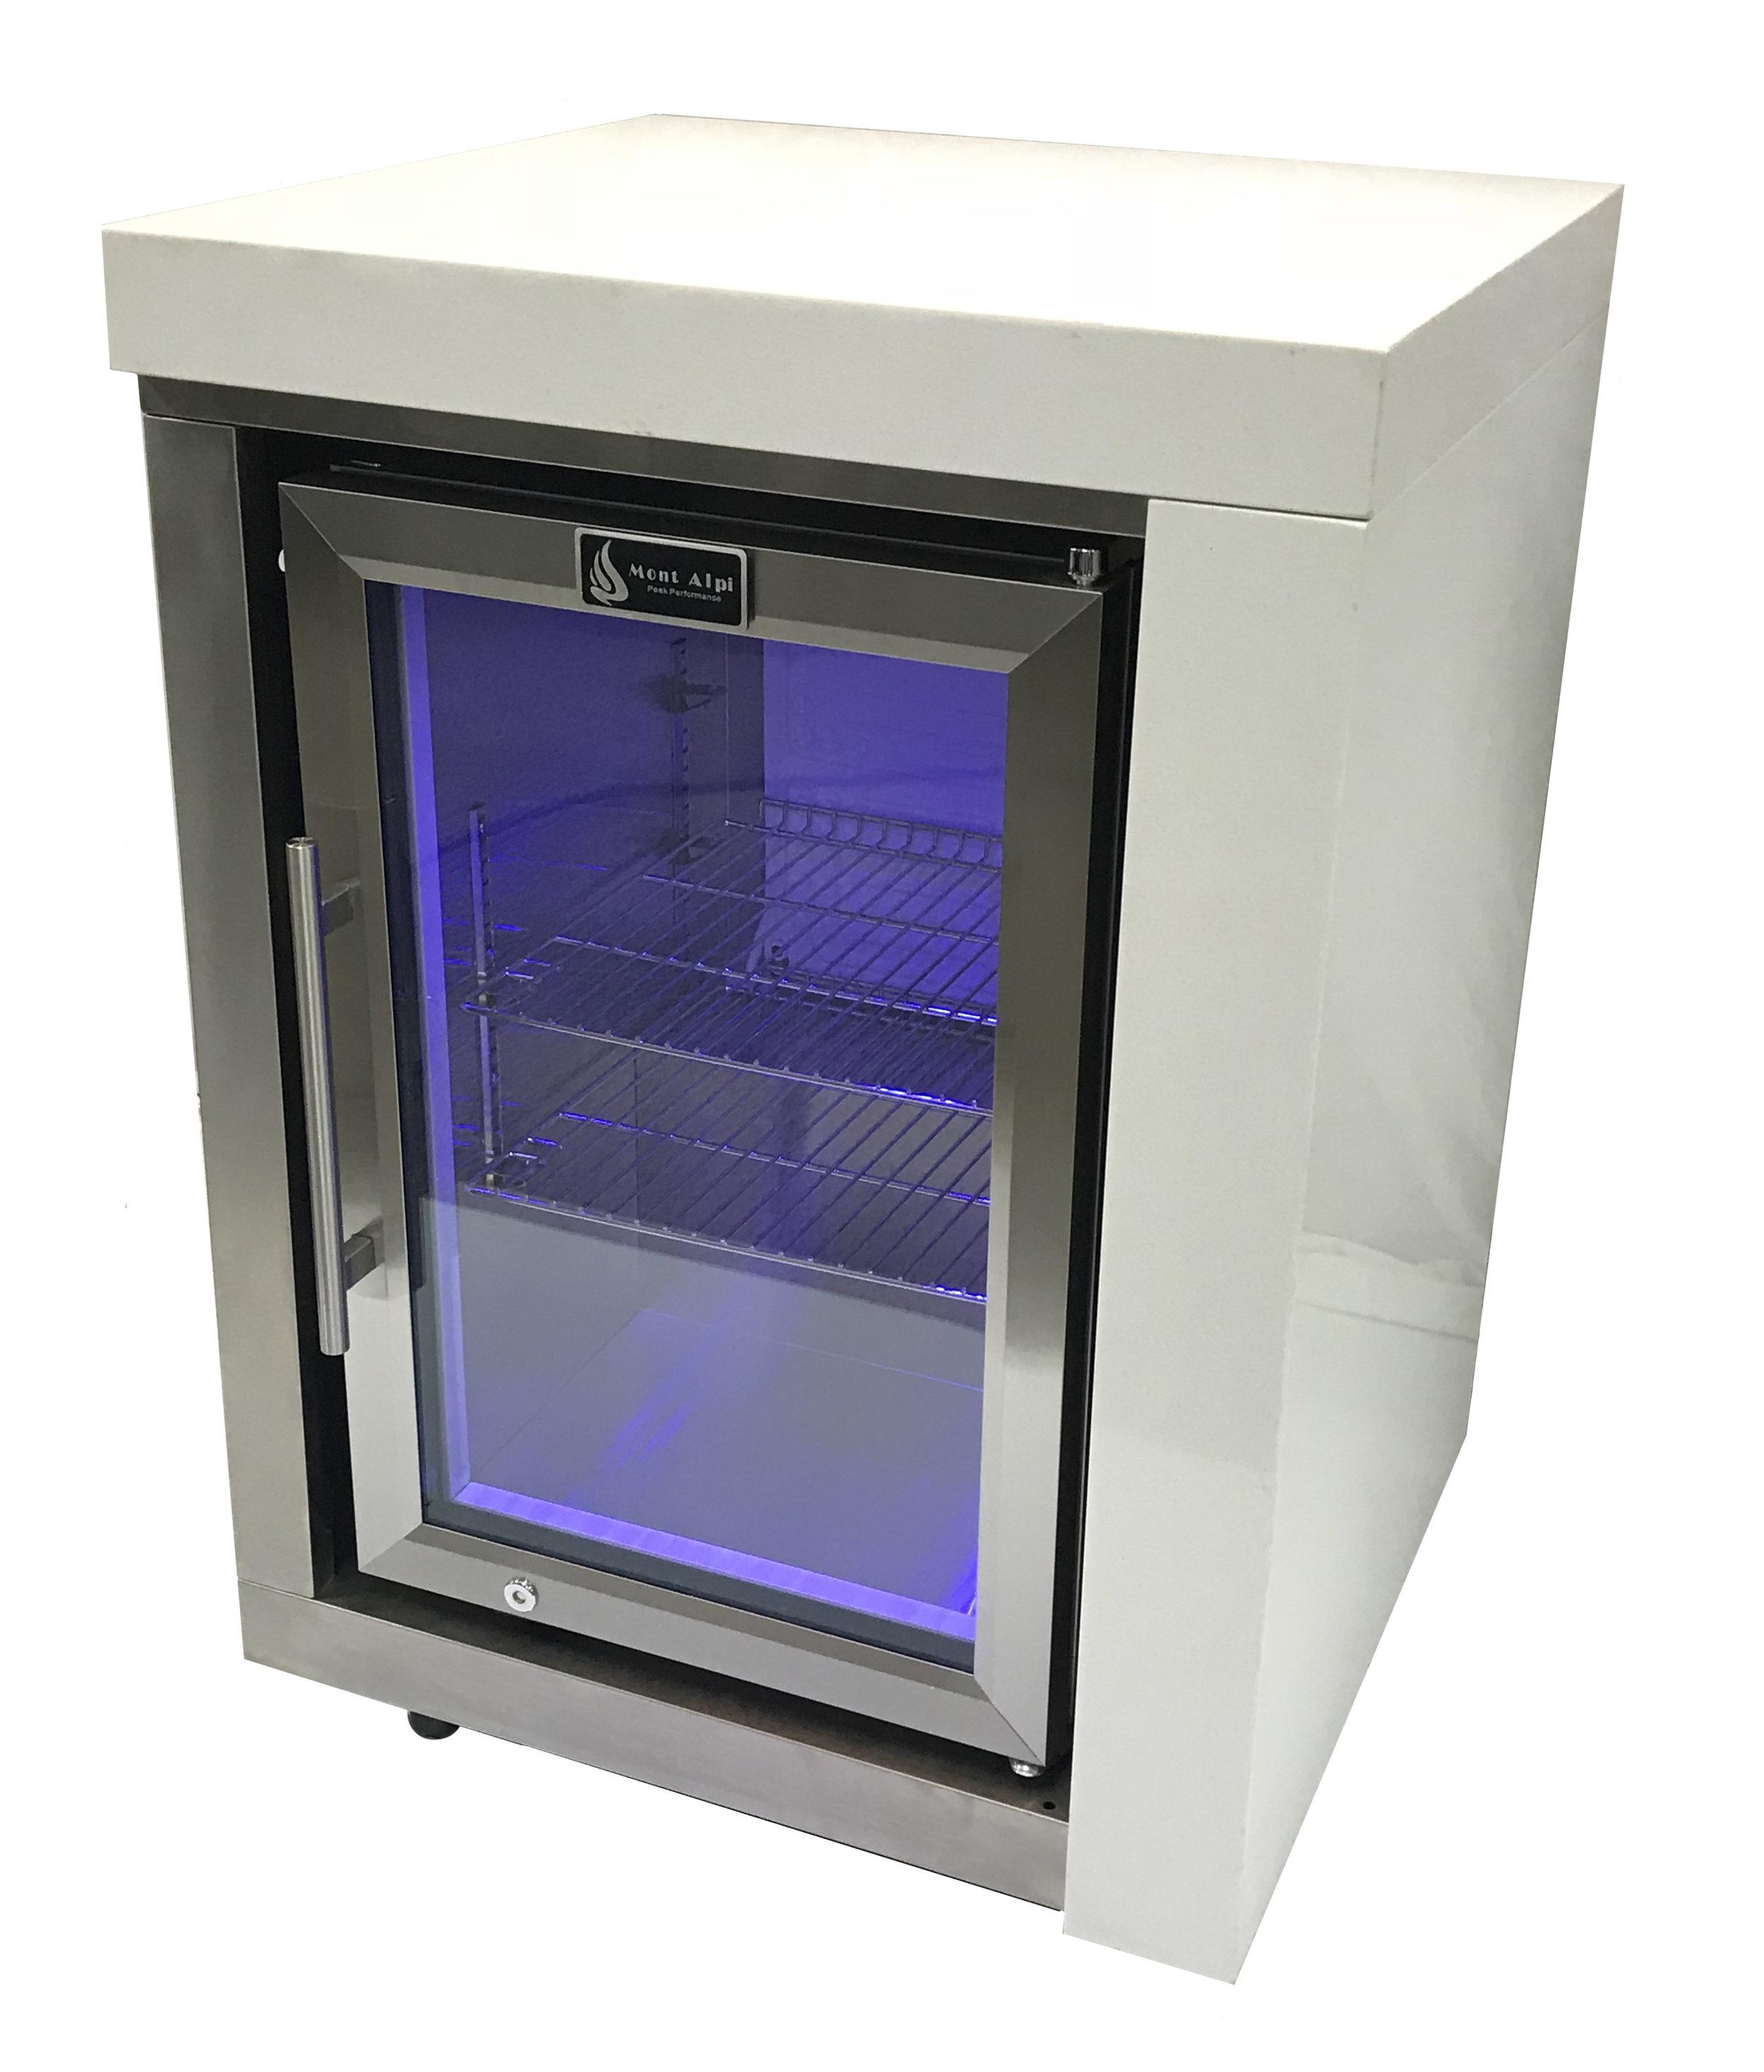 fridge right angle jpeg.jpg